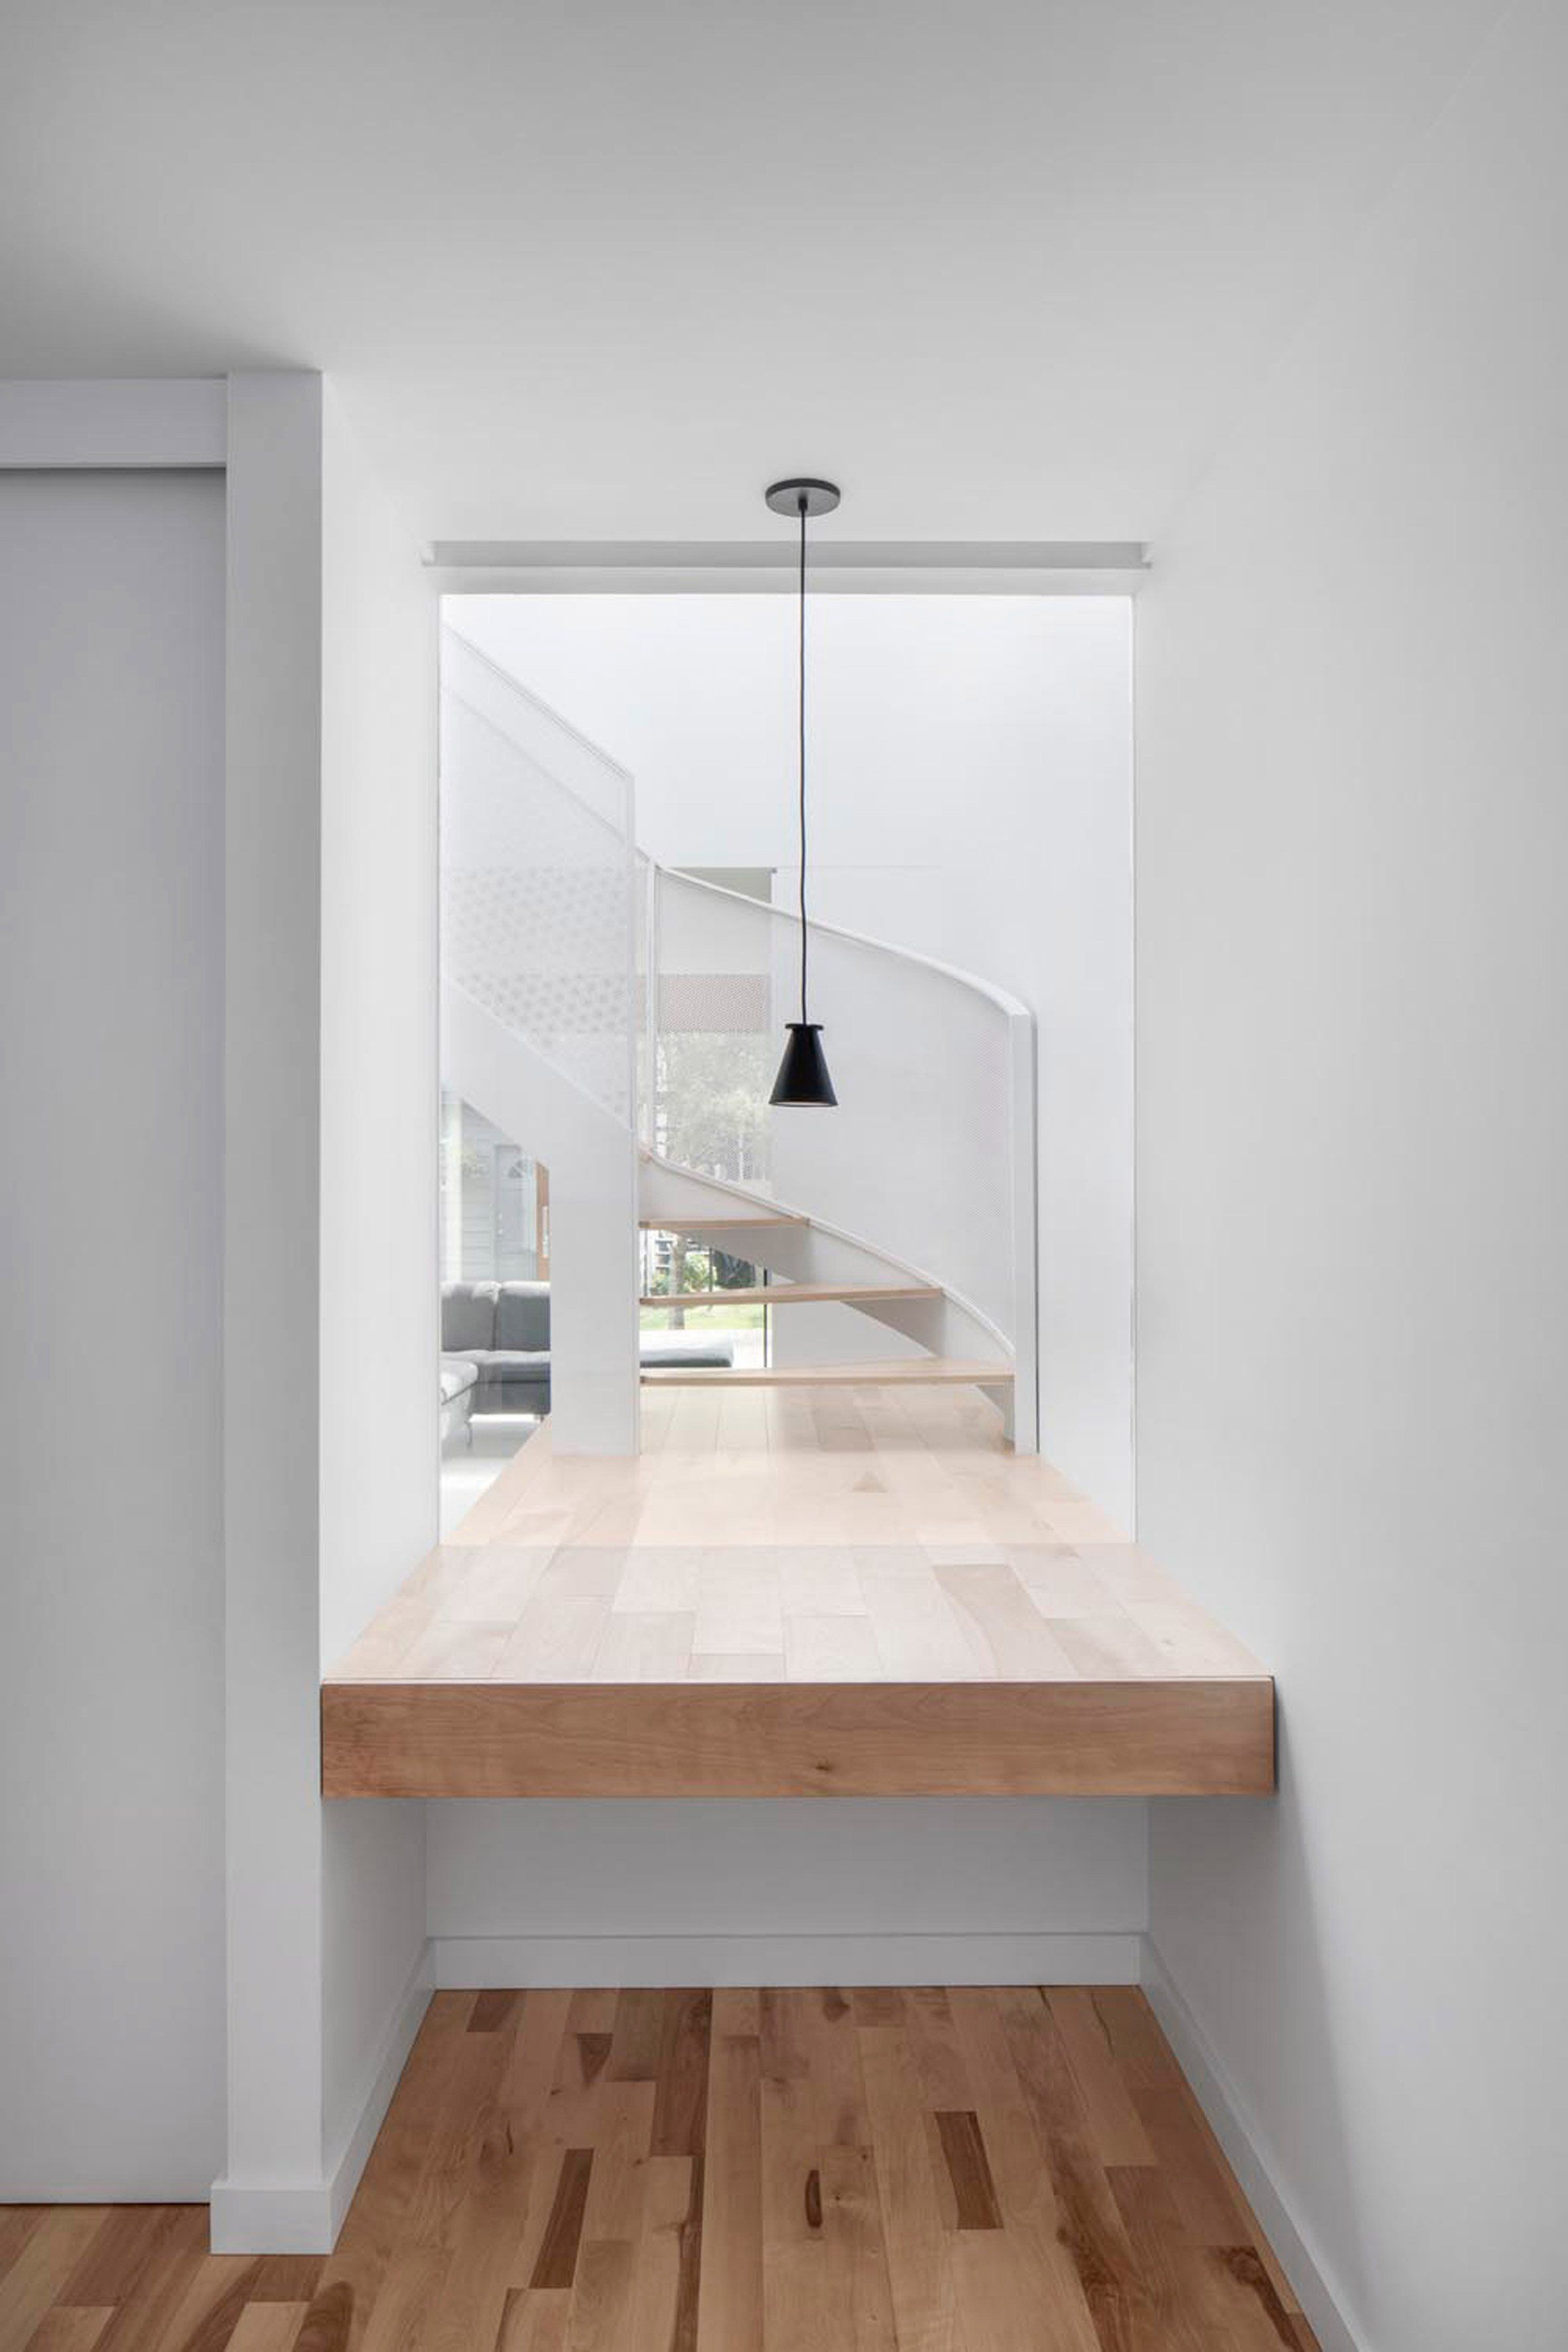 Pin By Virginia Turcio On Zip Residential Interior Design